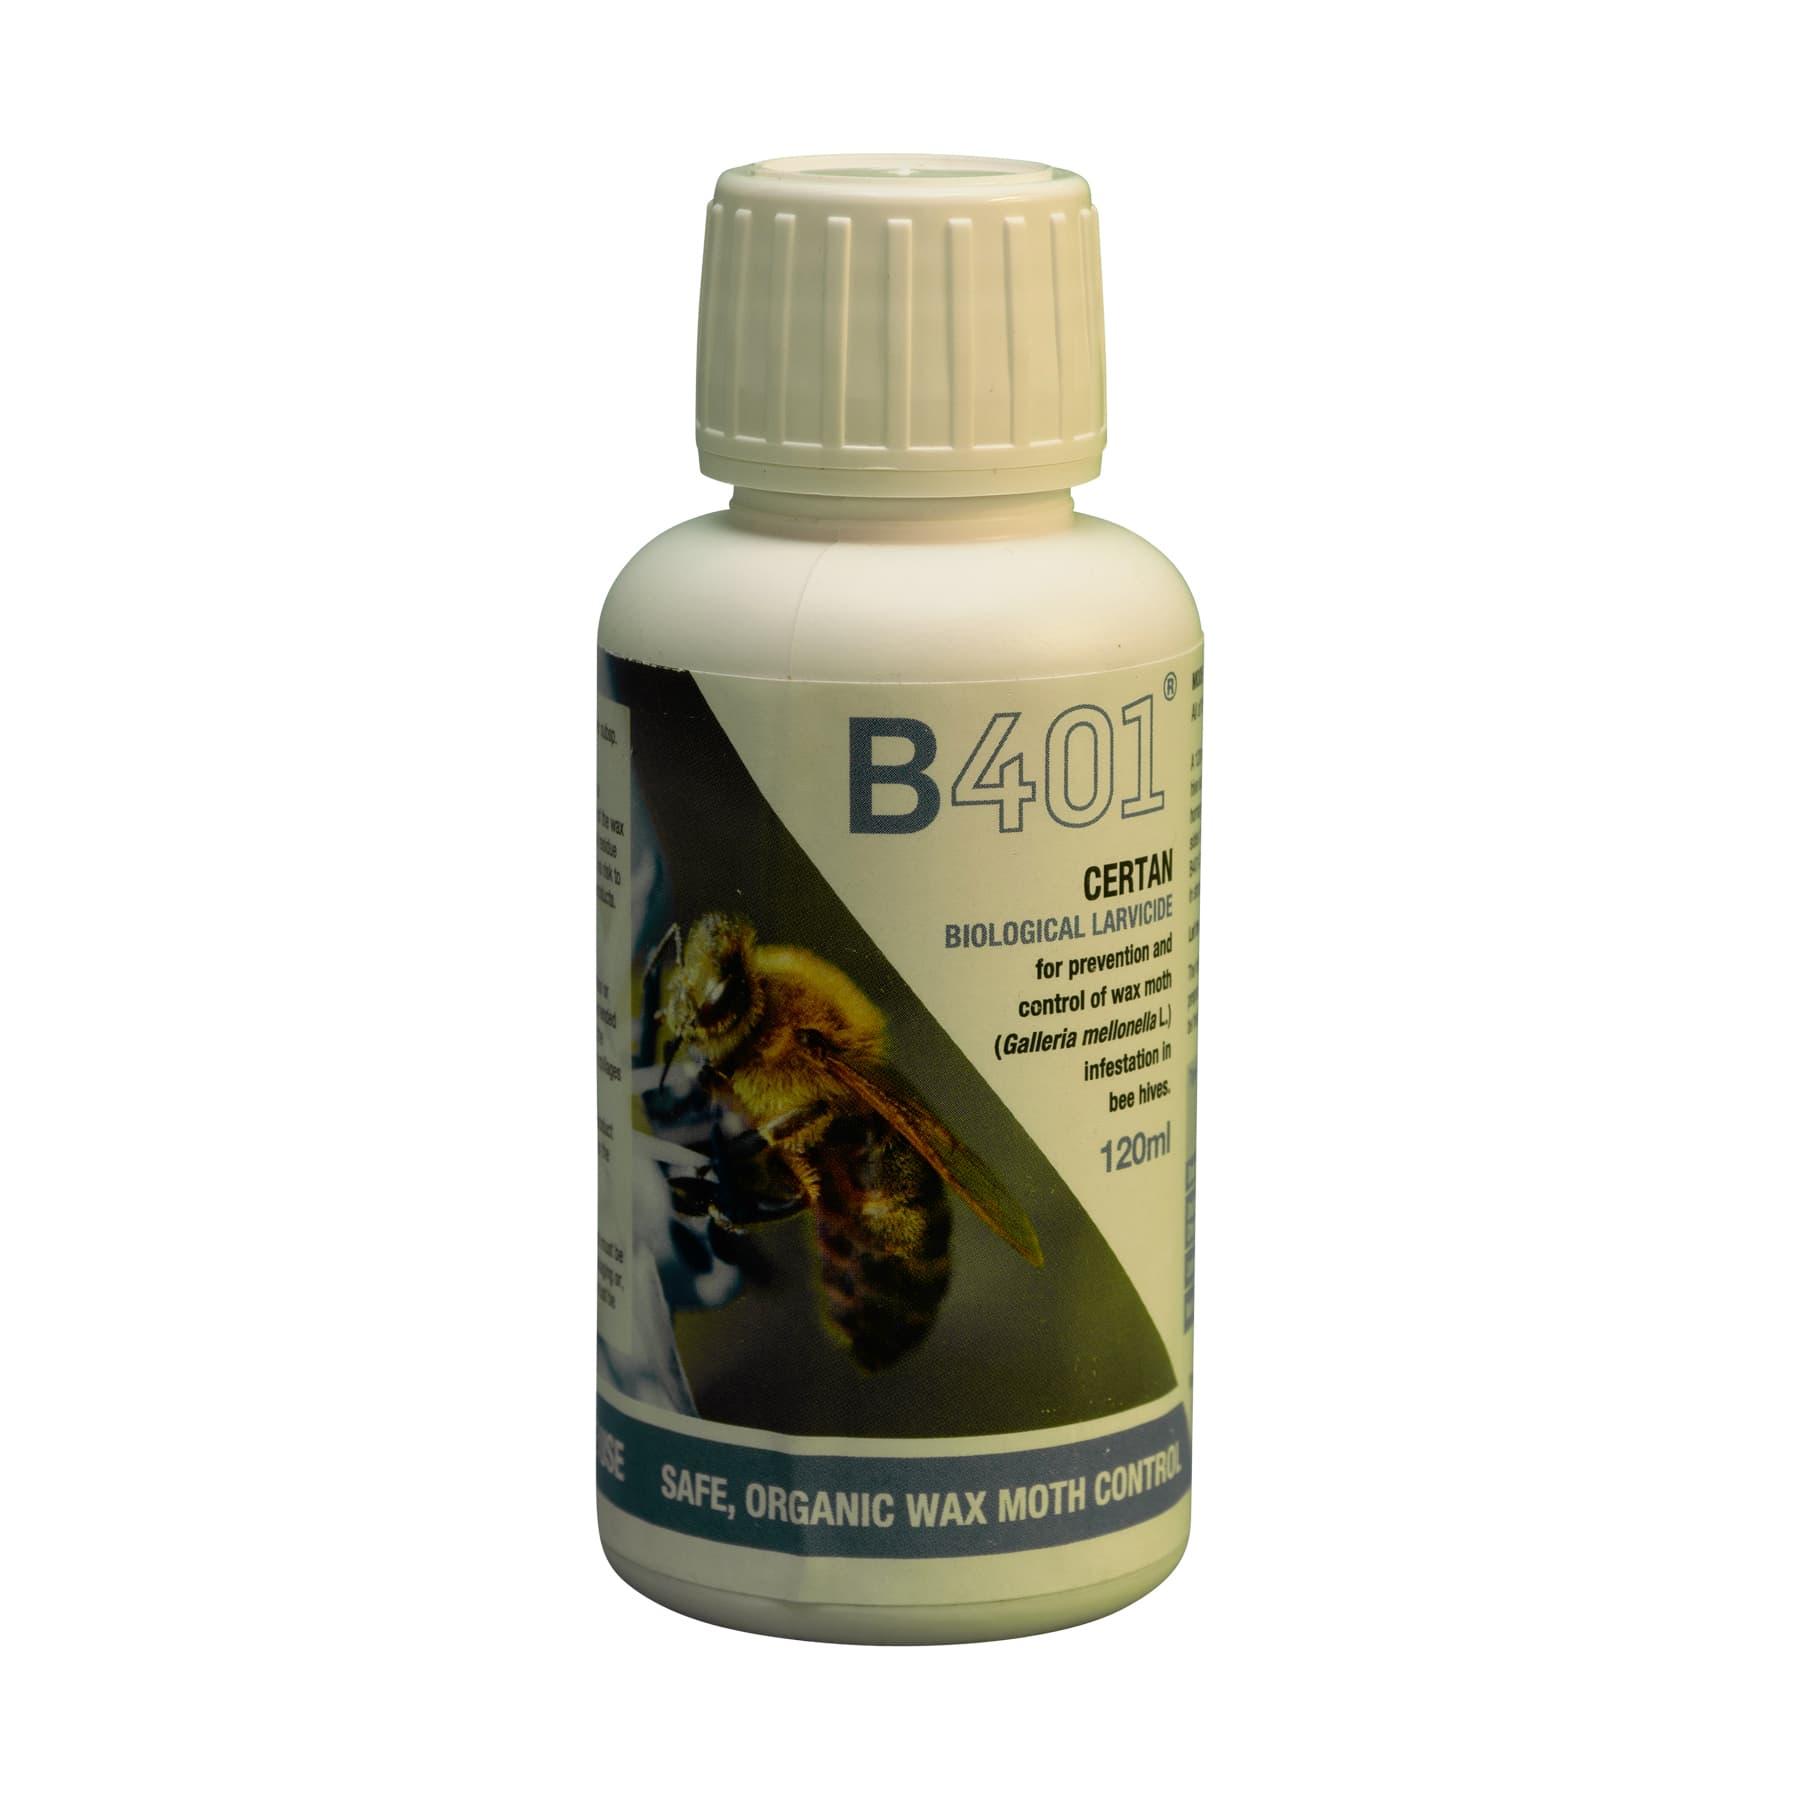 B 401 zur biol. Wachsmottenbekämpfung